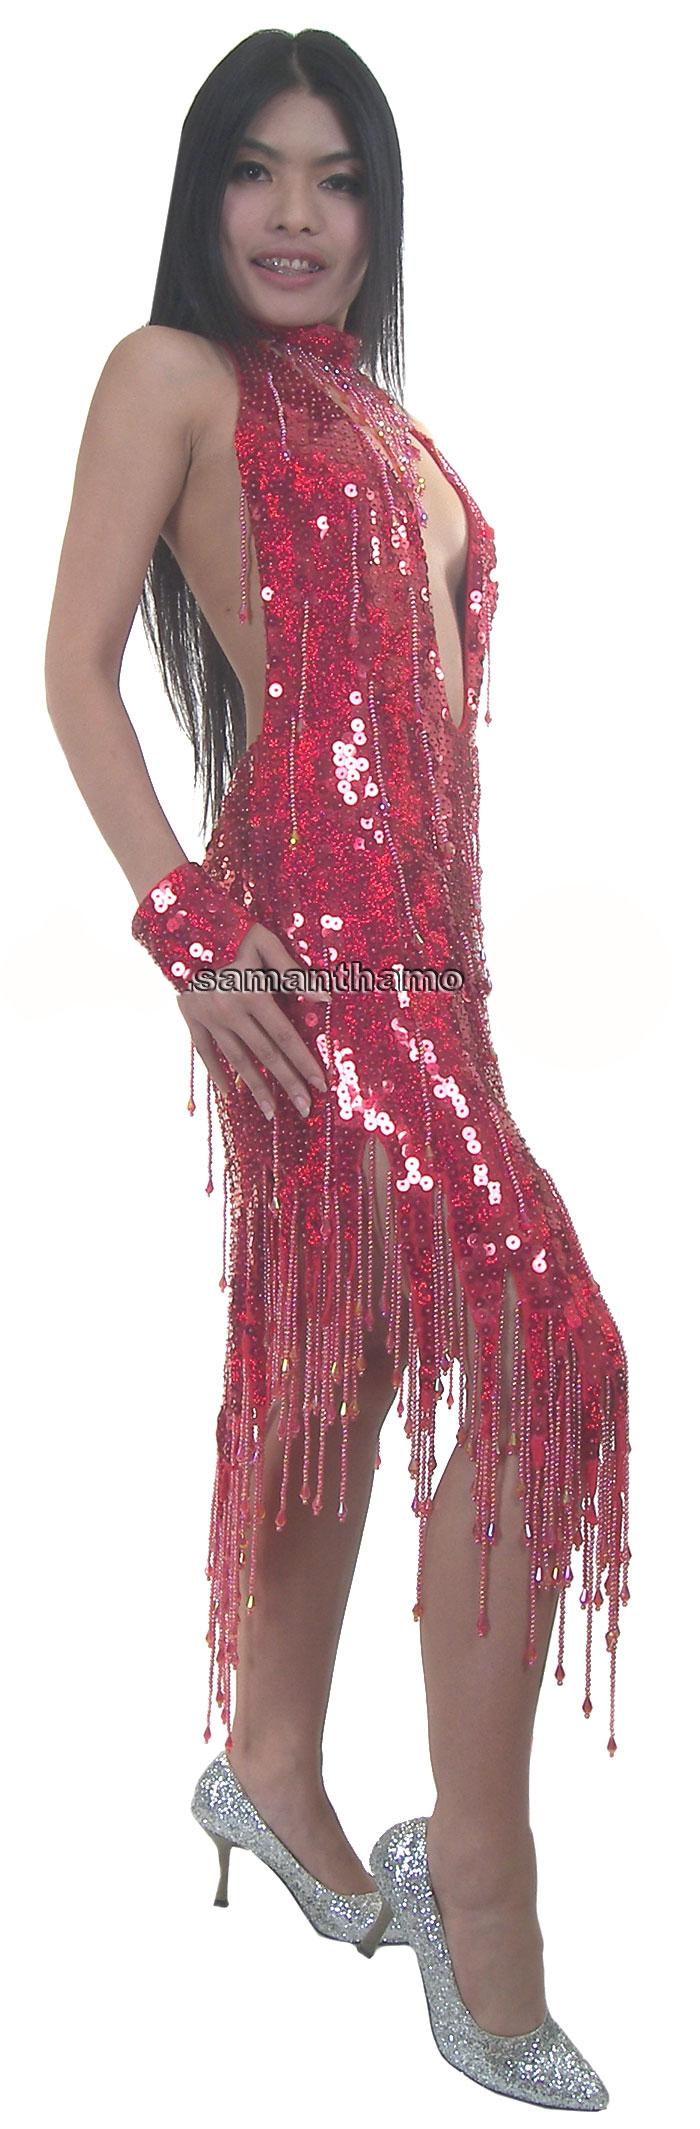 products/salsa-dance-dress.jpg